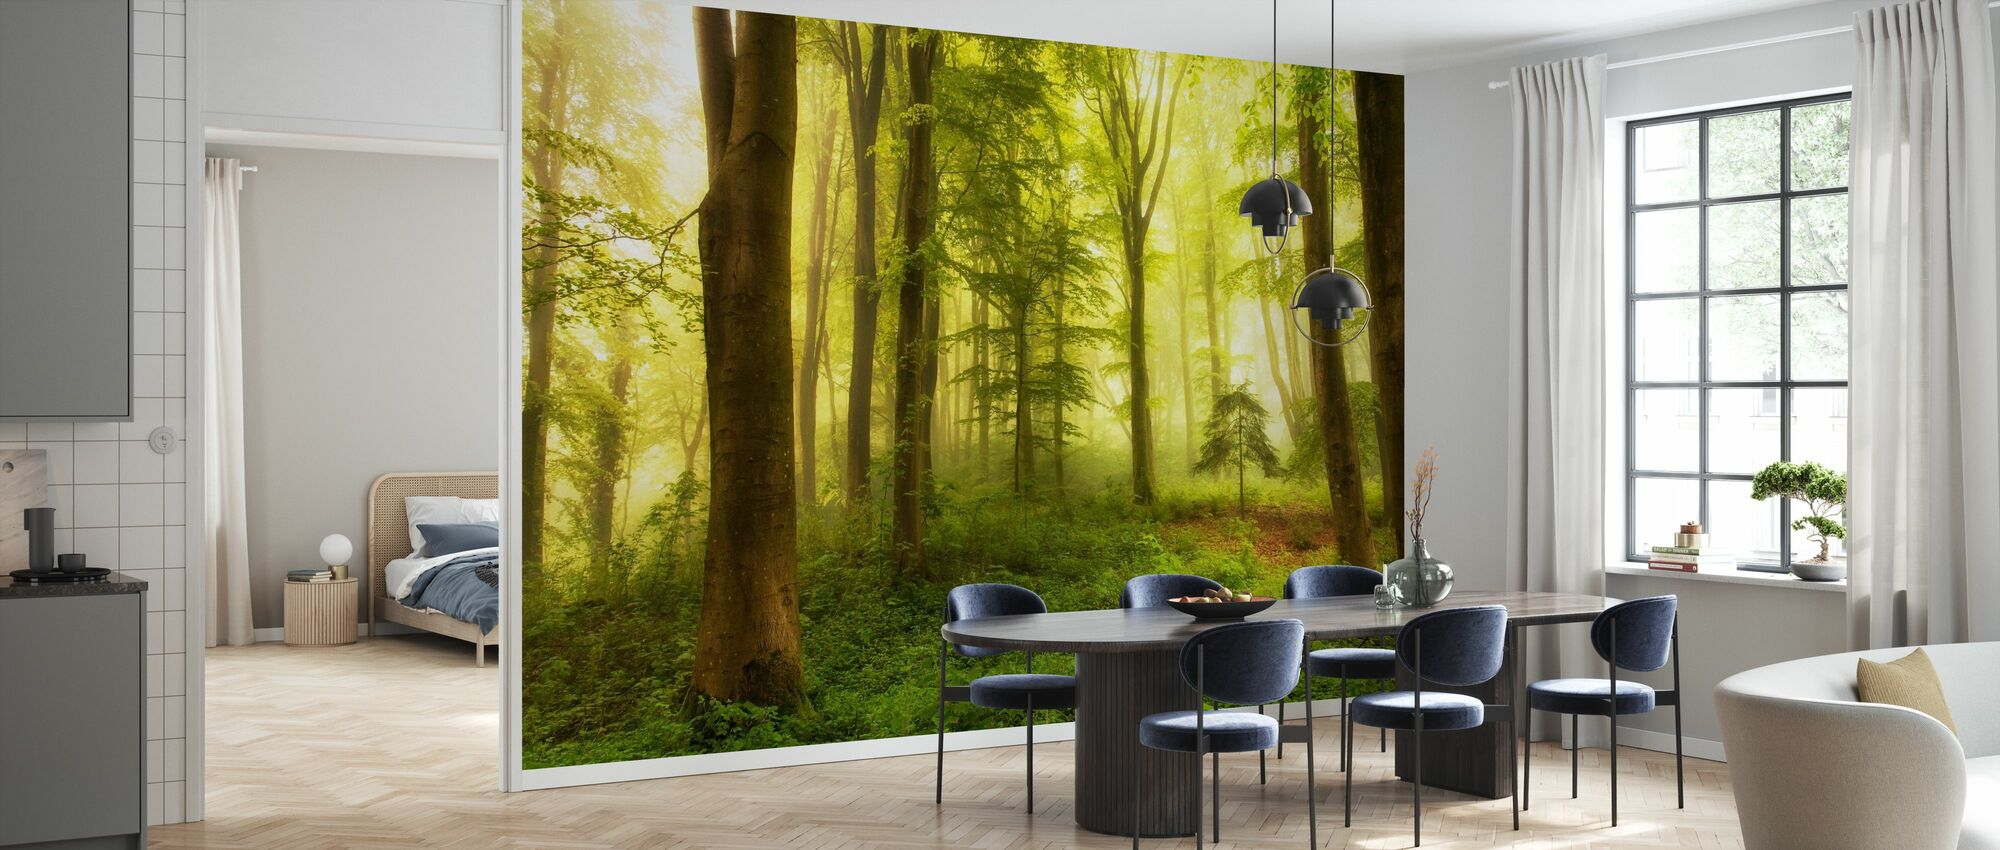 Little Tree - Wallpaper - Kitchen